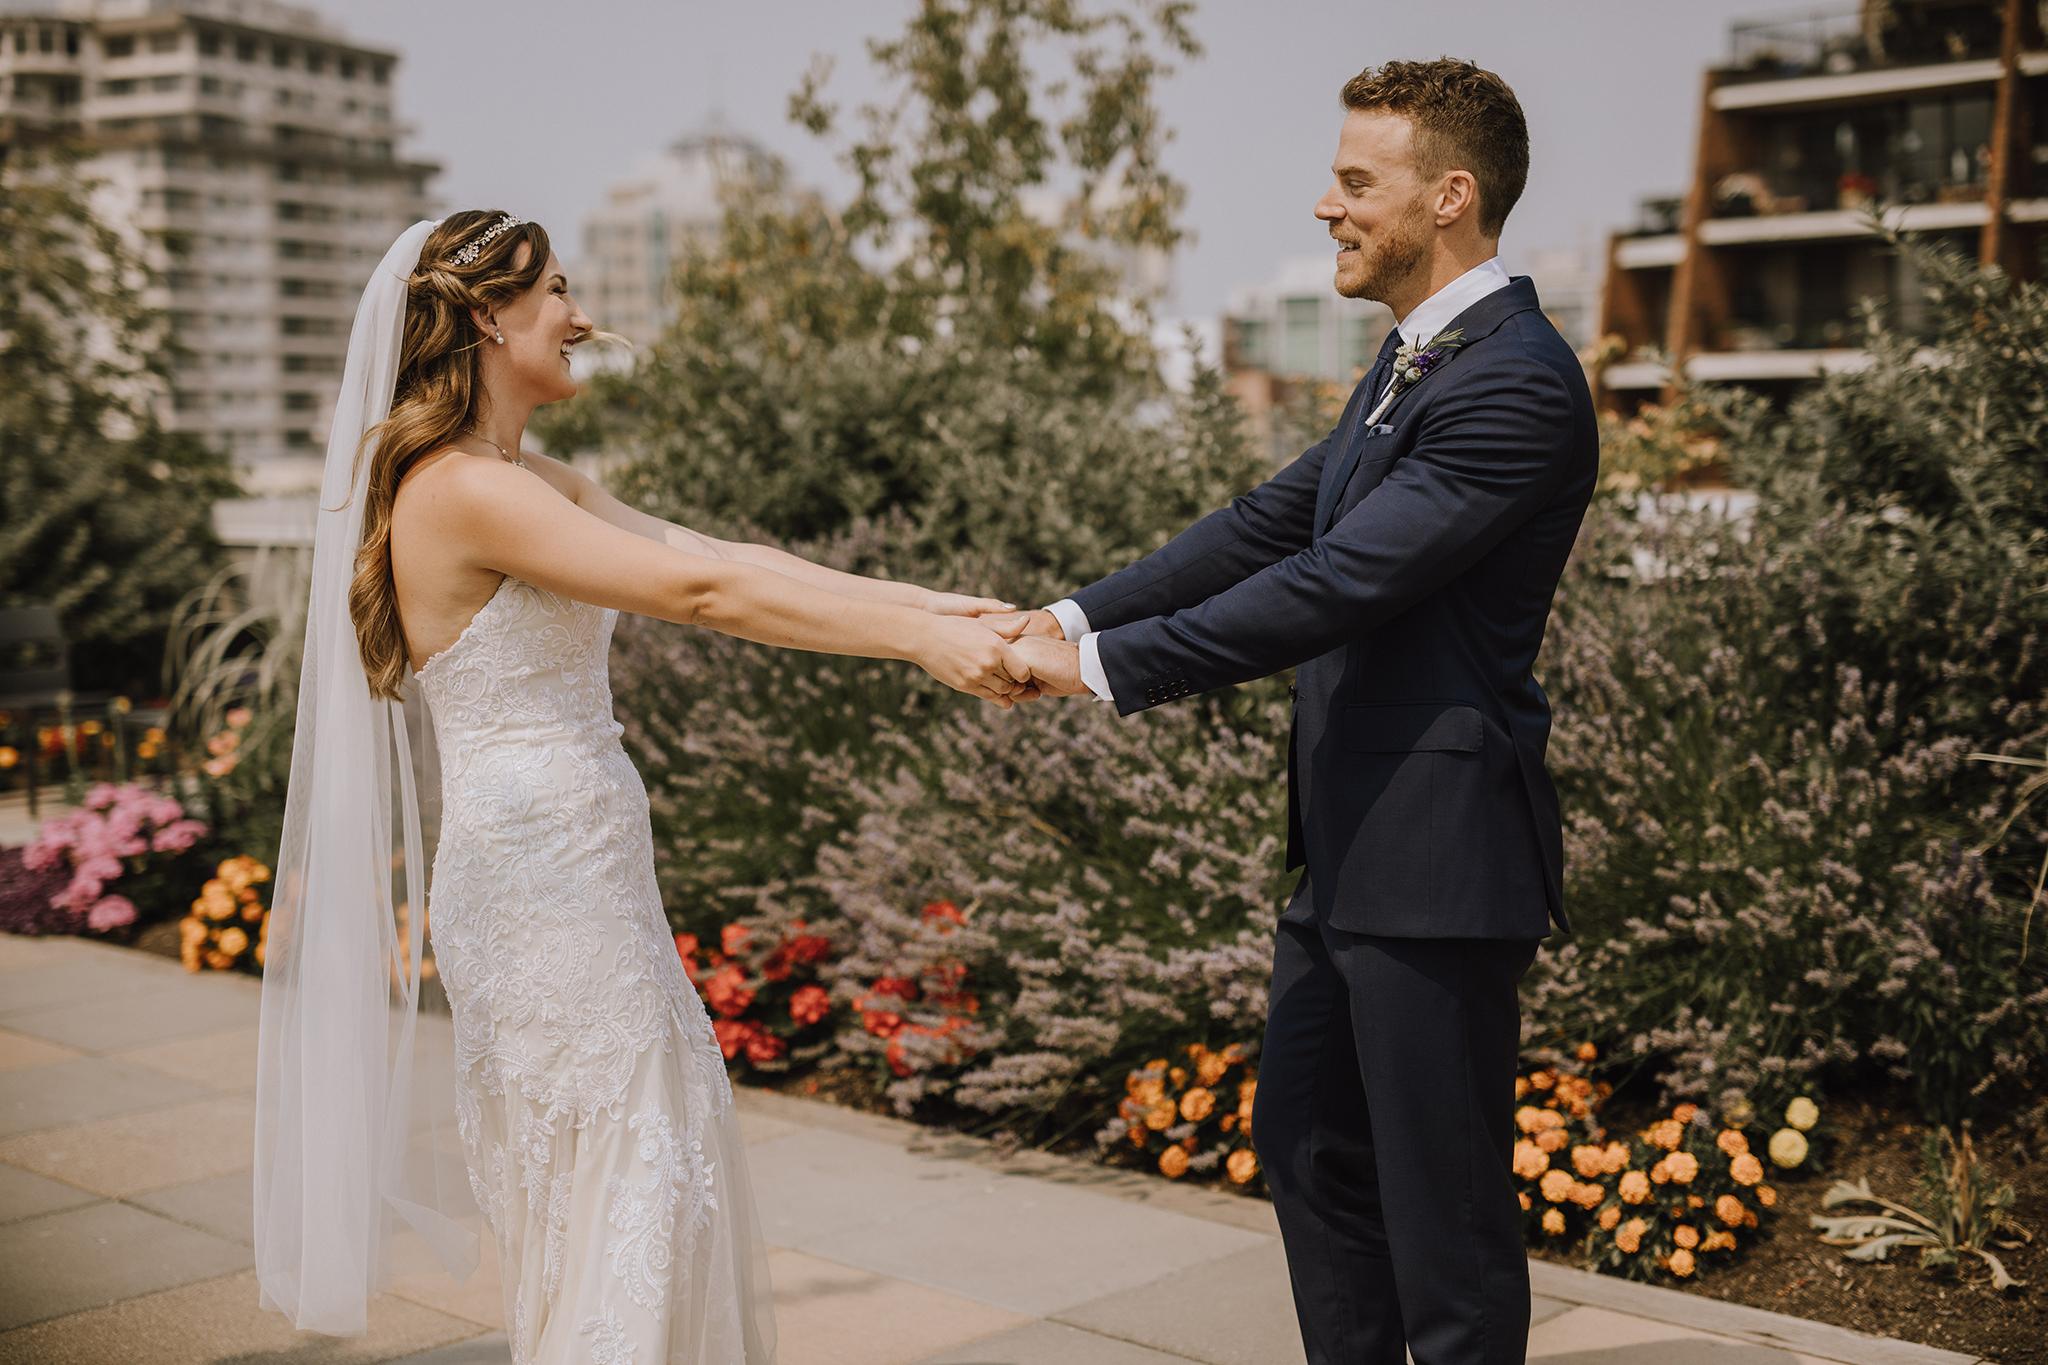 Balzenka & Mathew by Destinations Weddings Victoria